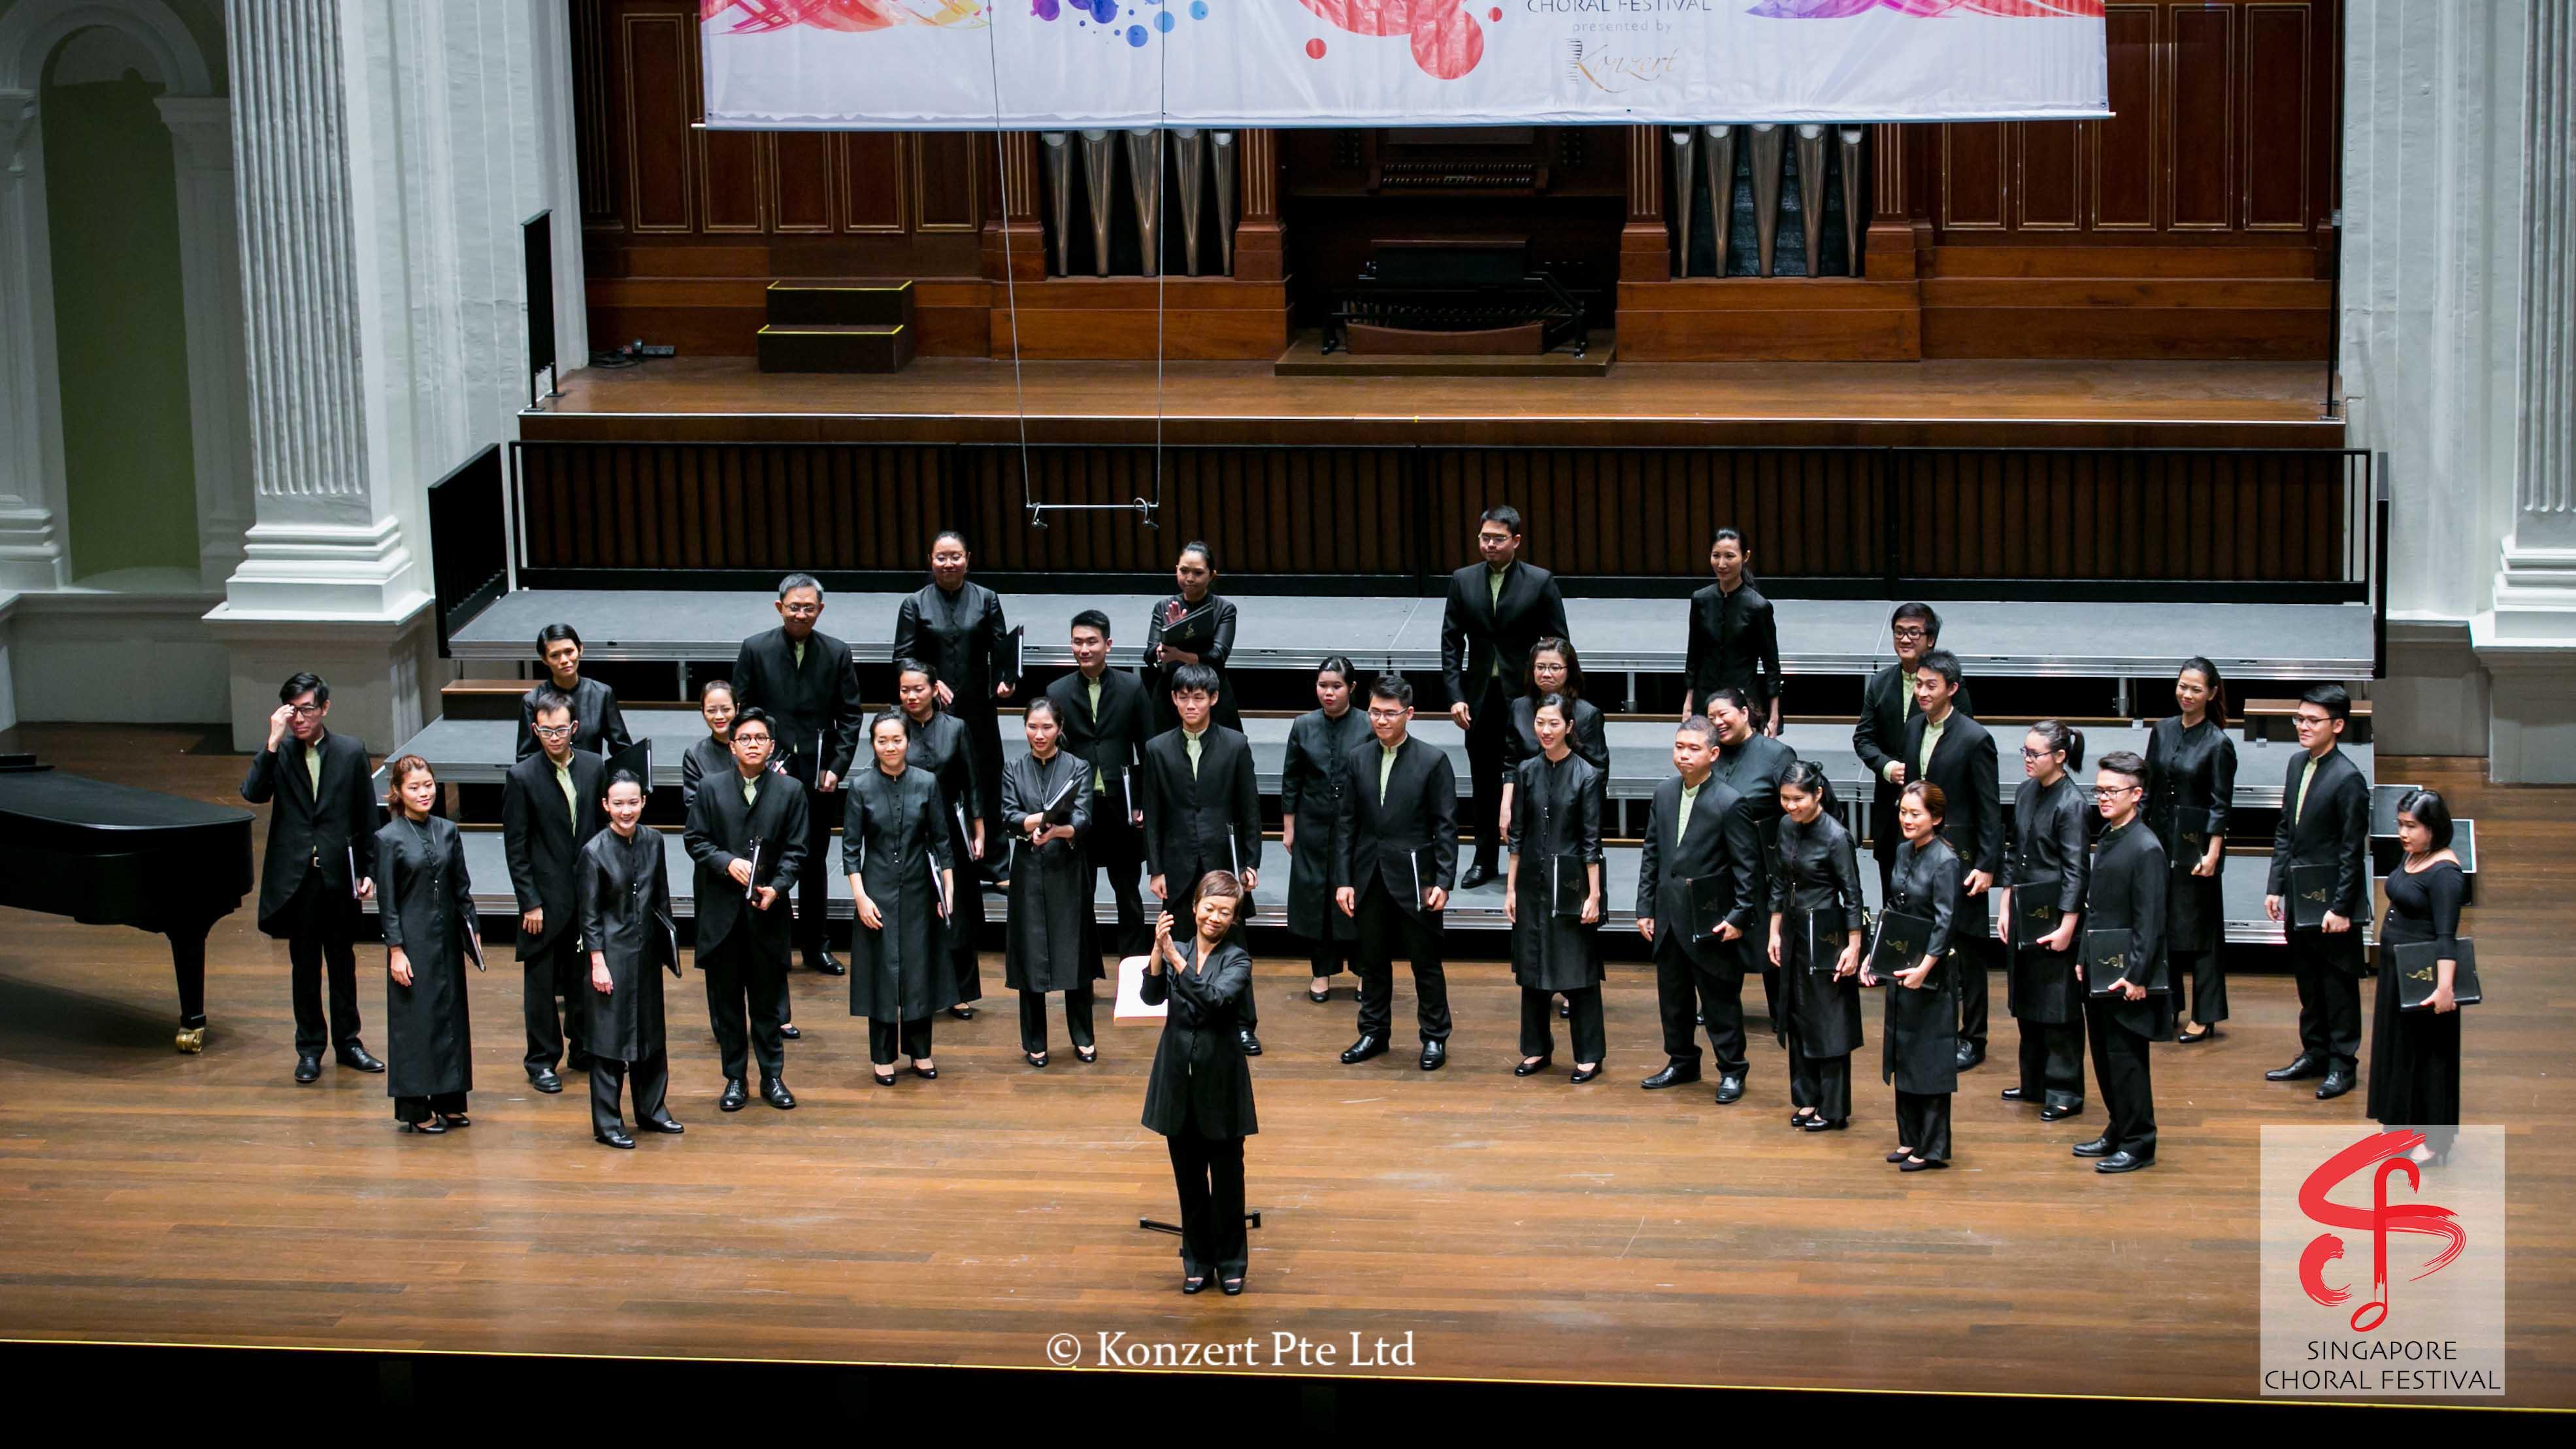 Singapore Choral Festival 8-8-15 (232).jpg